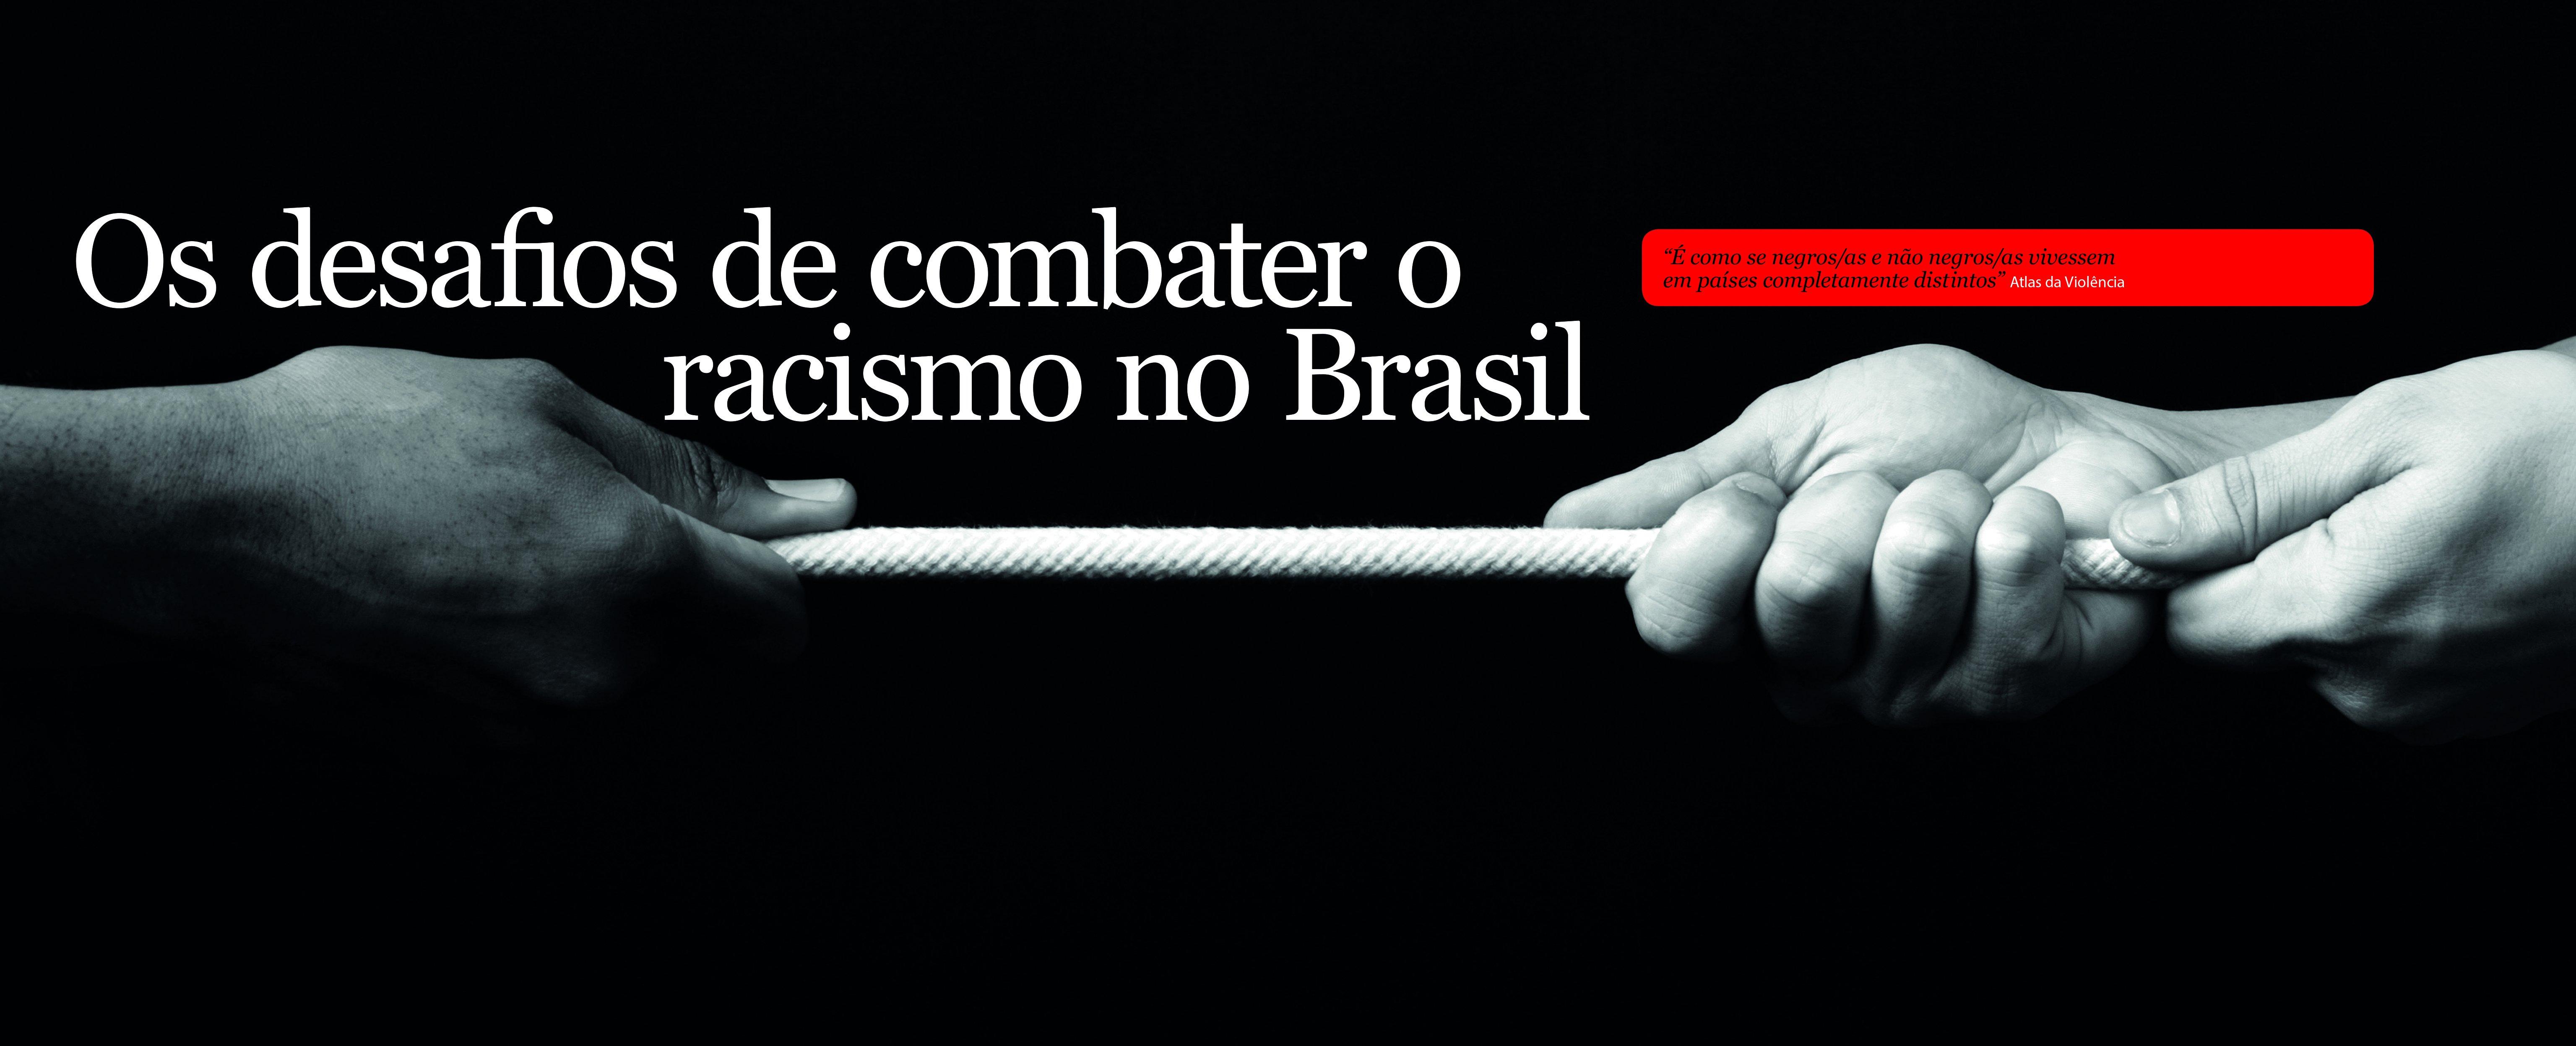 Os desafios de combater o racismo no Brasil